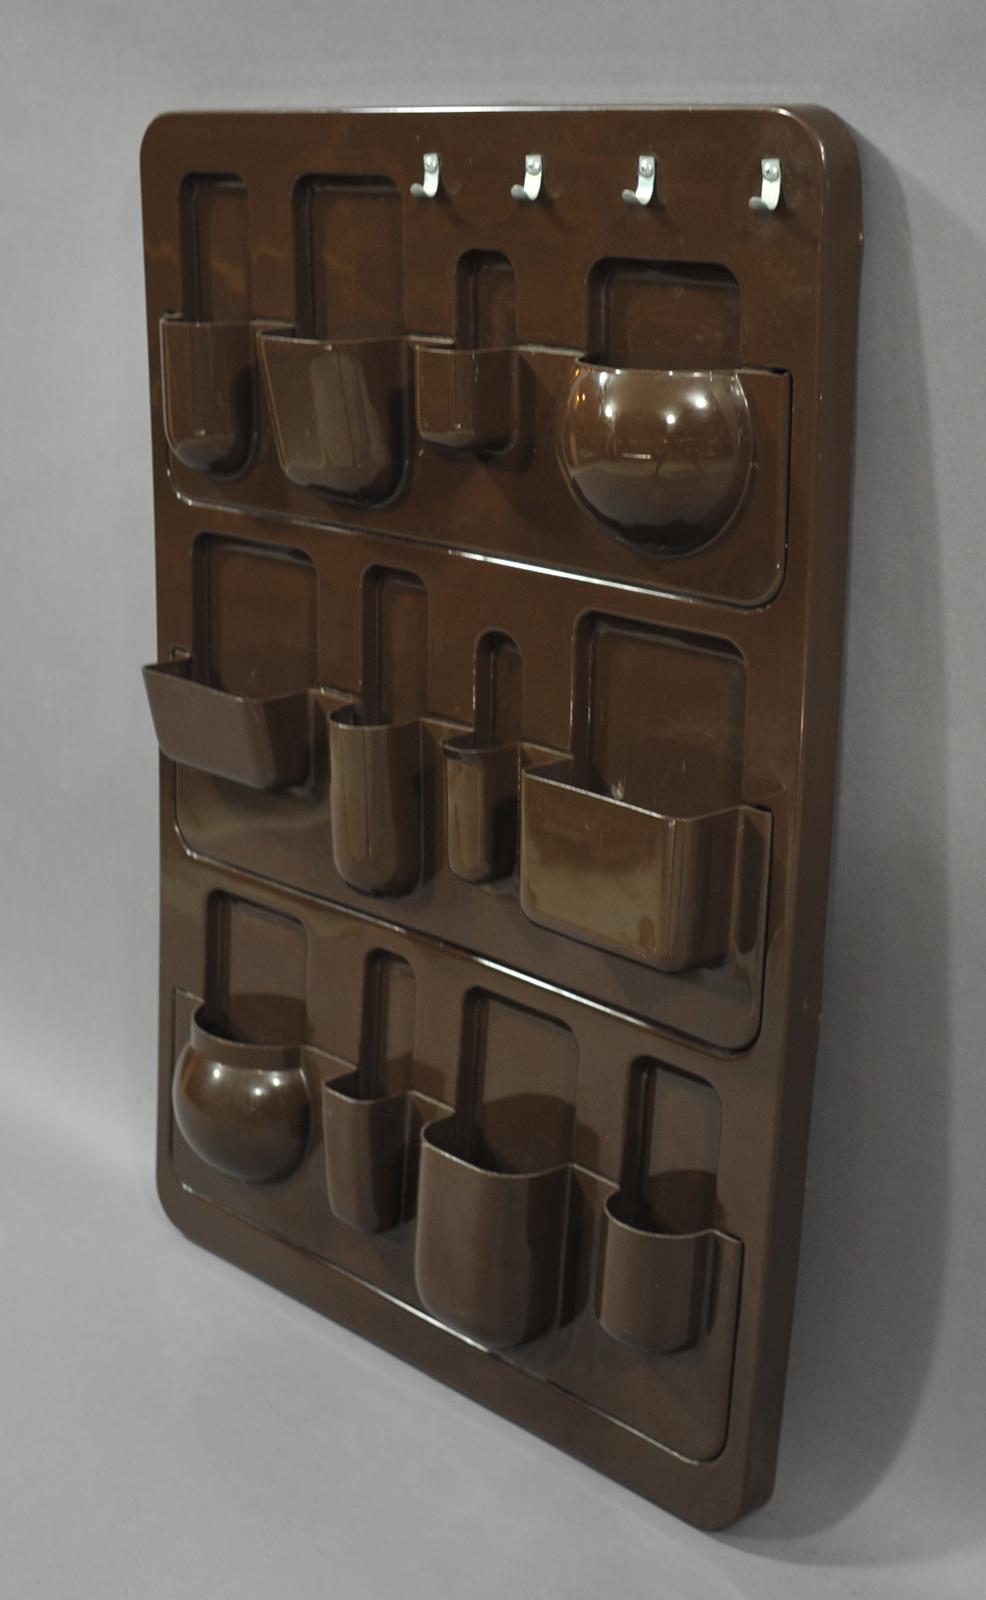 Vide poches en plastique type ustensilo modulolab for Poche de rangement mural